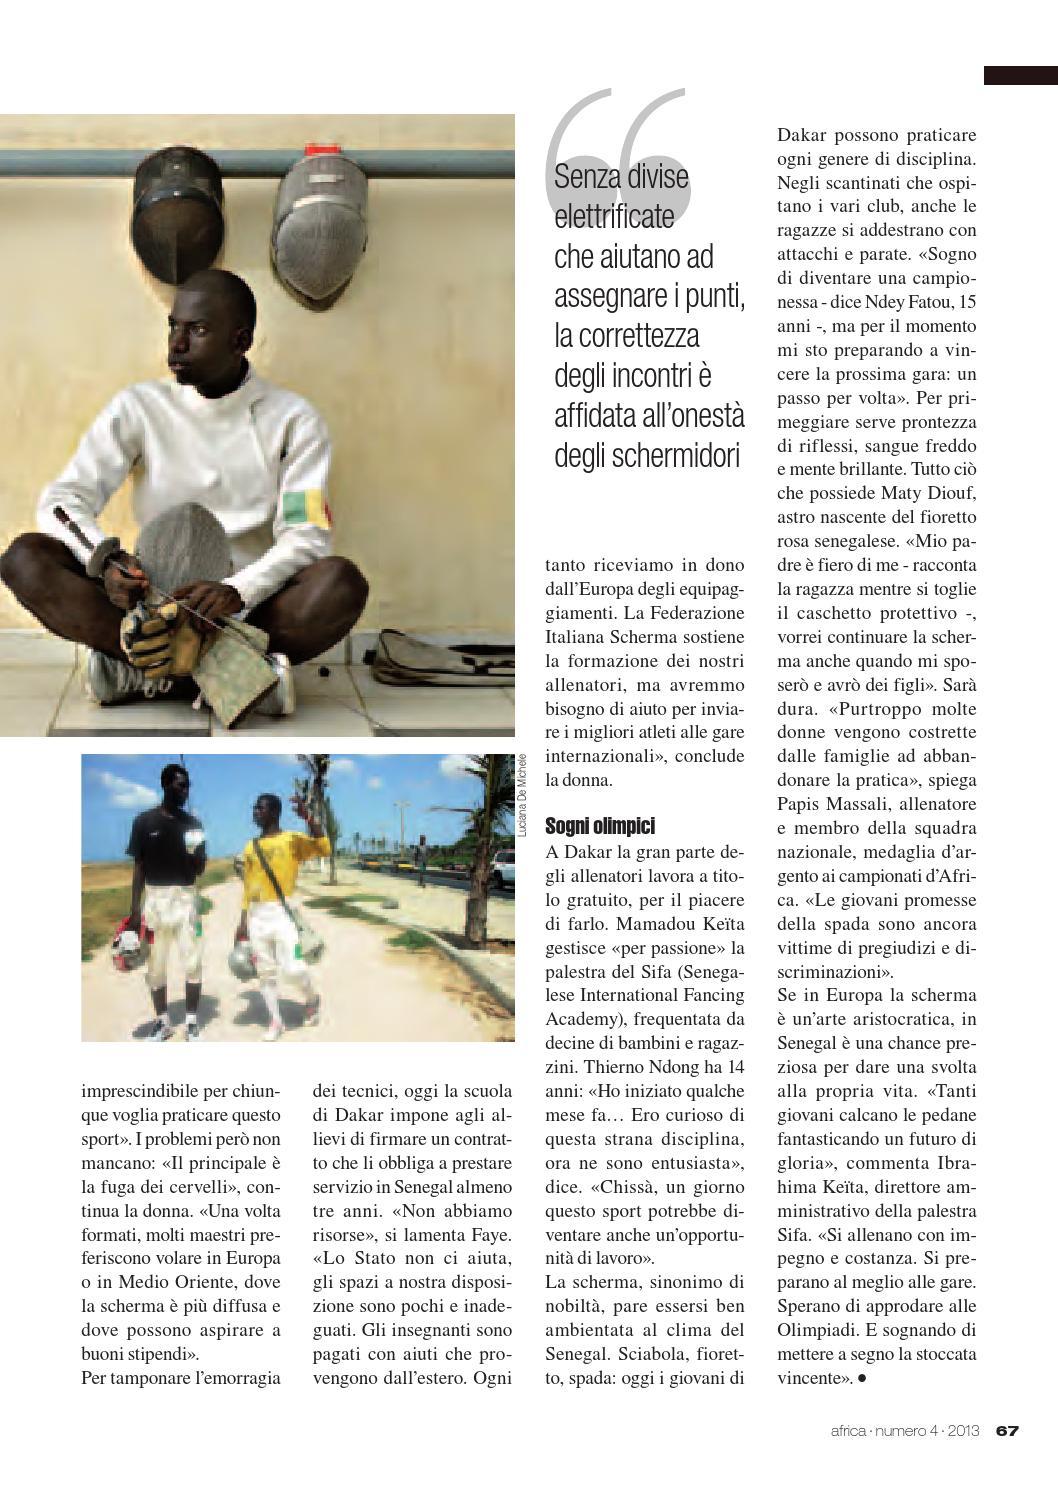 Dakar Senegal incontri